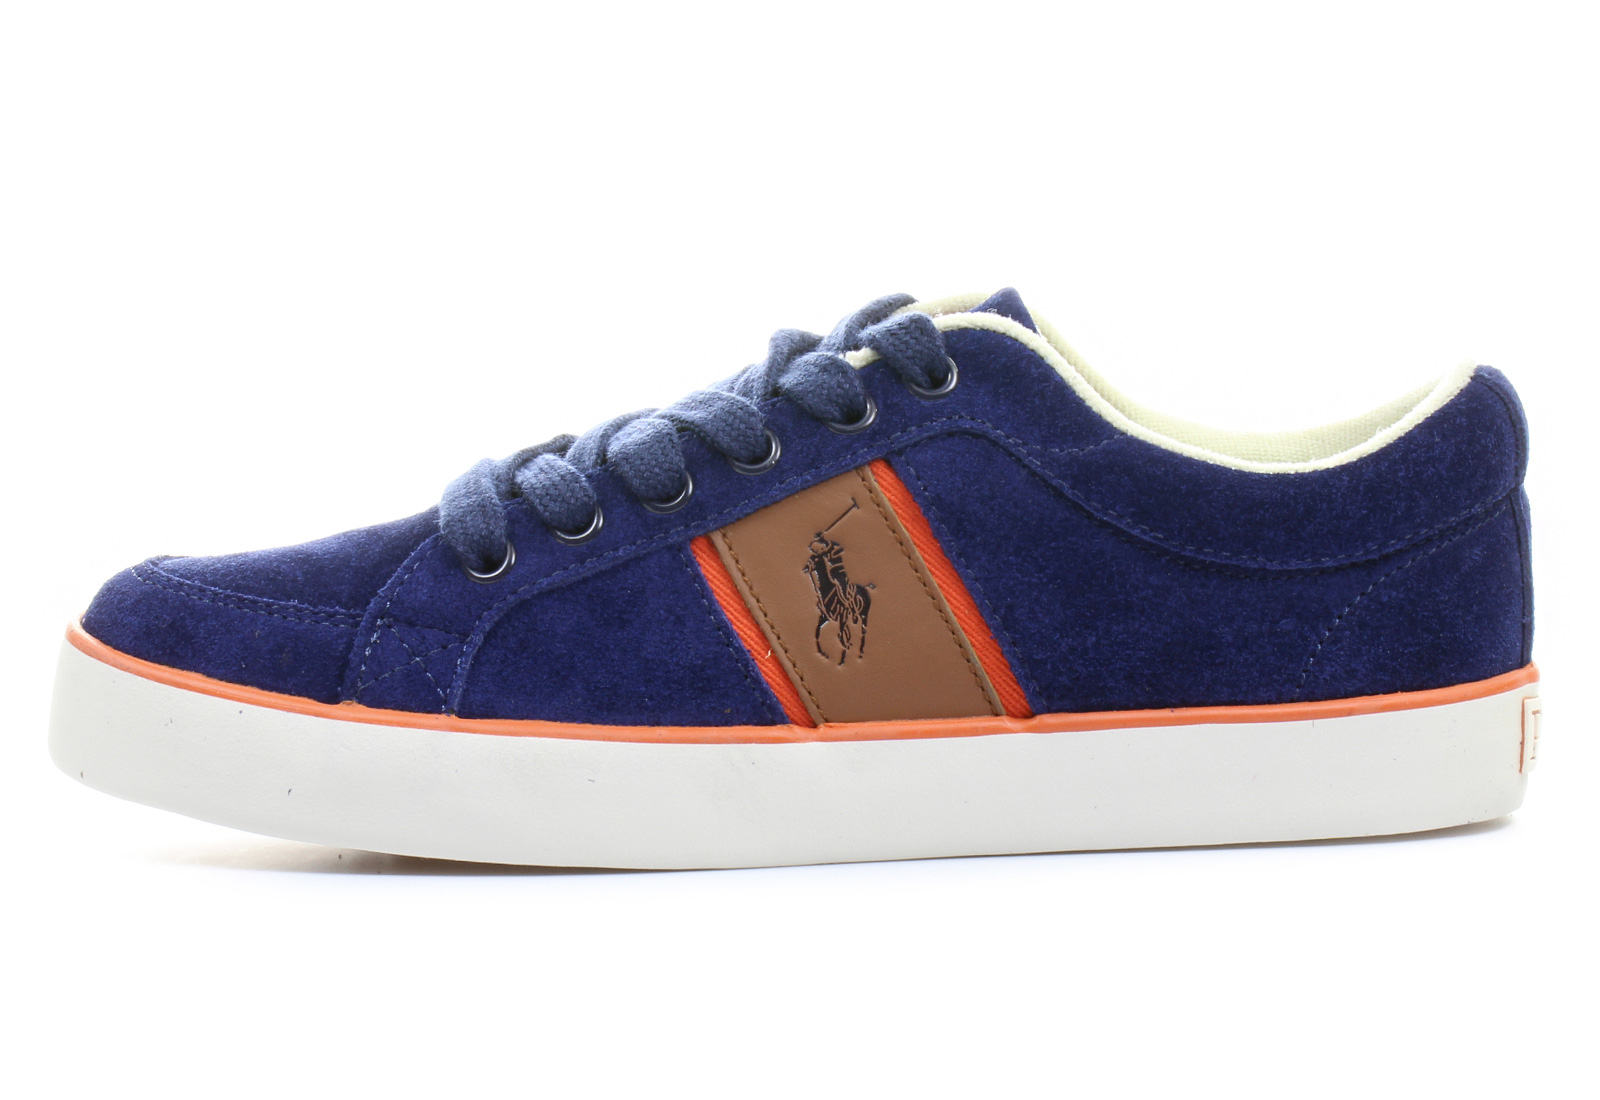 Ralph 217 Online W4e58 R Boots Lauren Shoes SneakersAnd Bolingbrook Polo Shop For Ii cFTl1JK